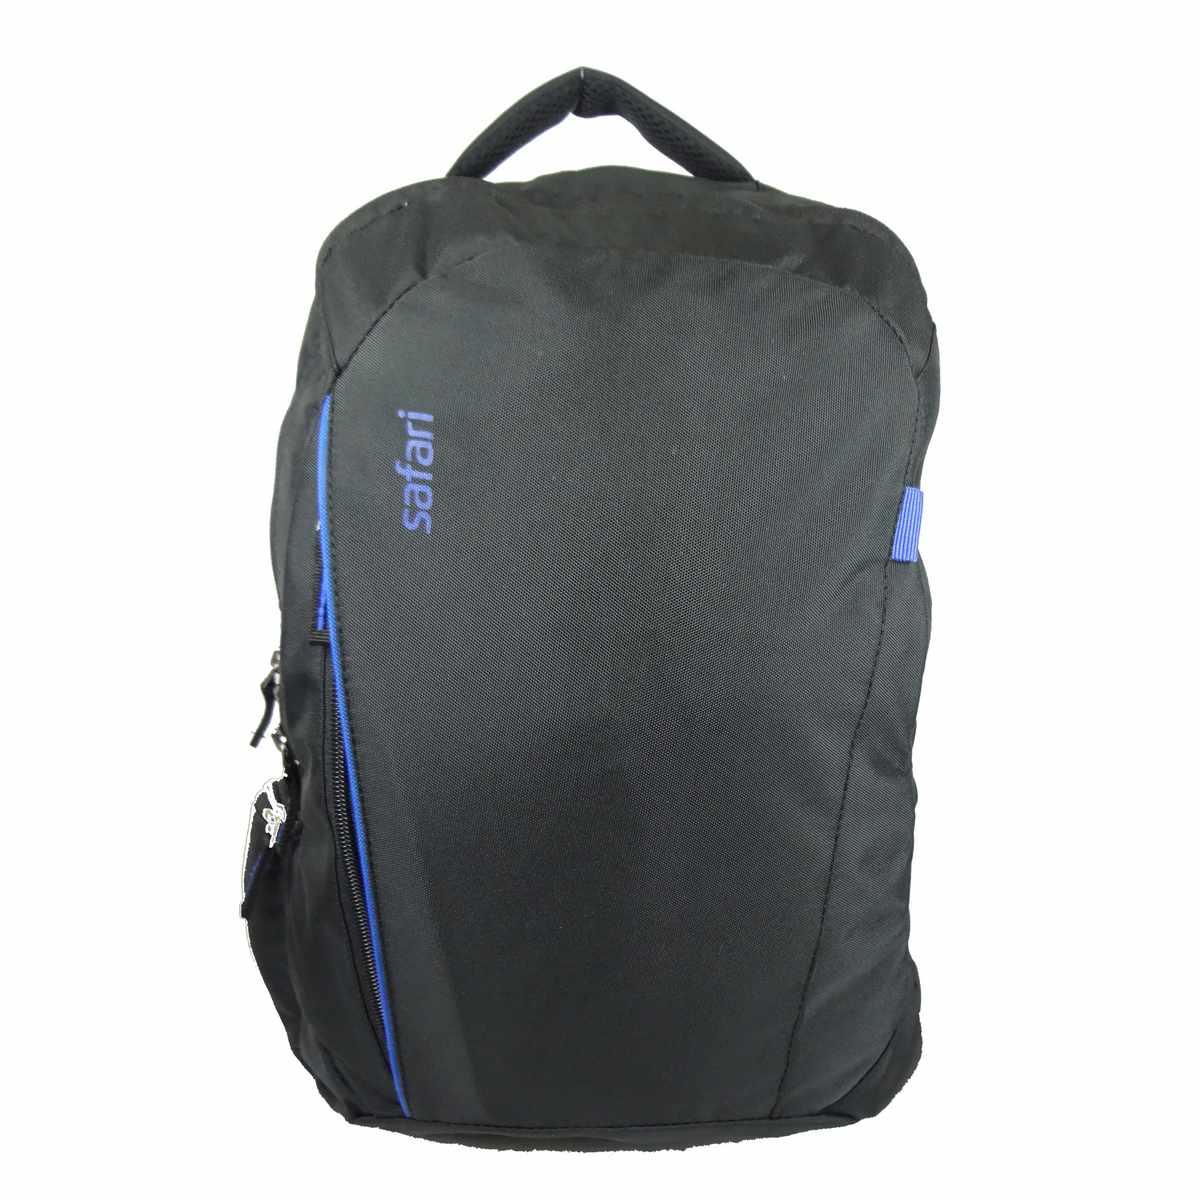 Safari Nirvana 16 Inch Laptop Backpack Bag 2 Compartment